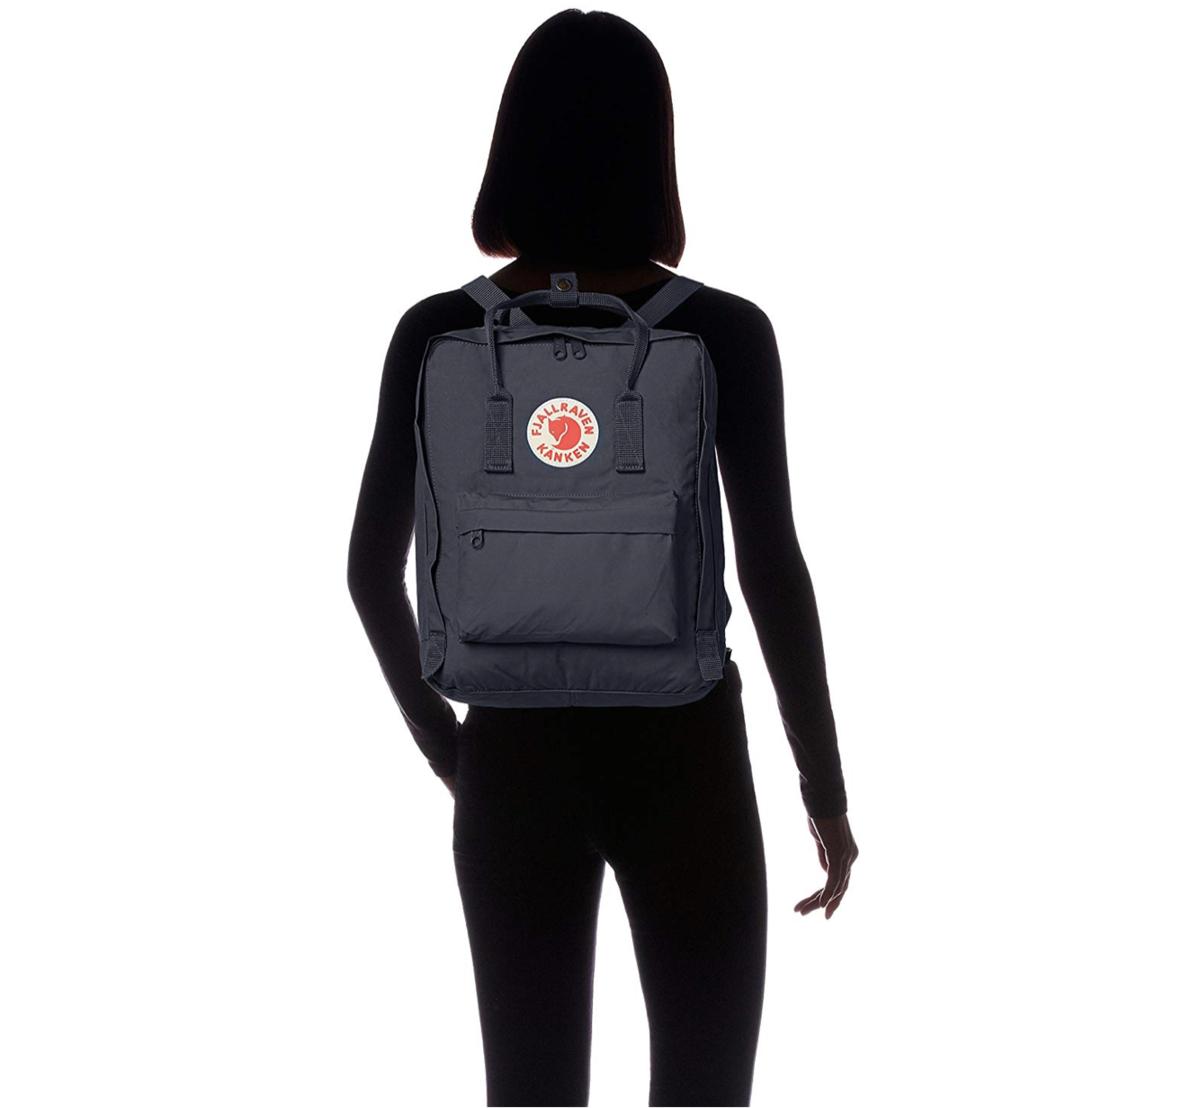 f:id:thebackpack:20190621195755p:plain